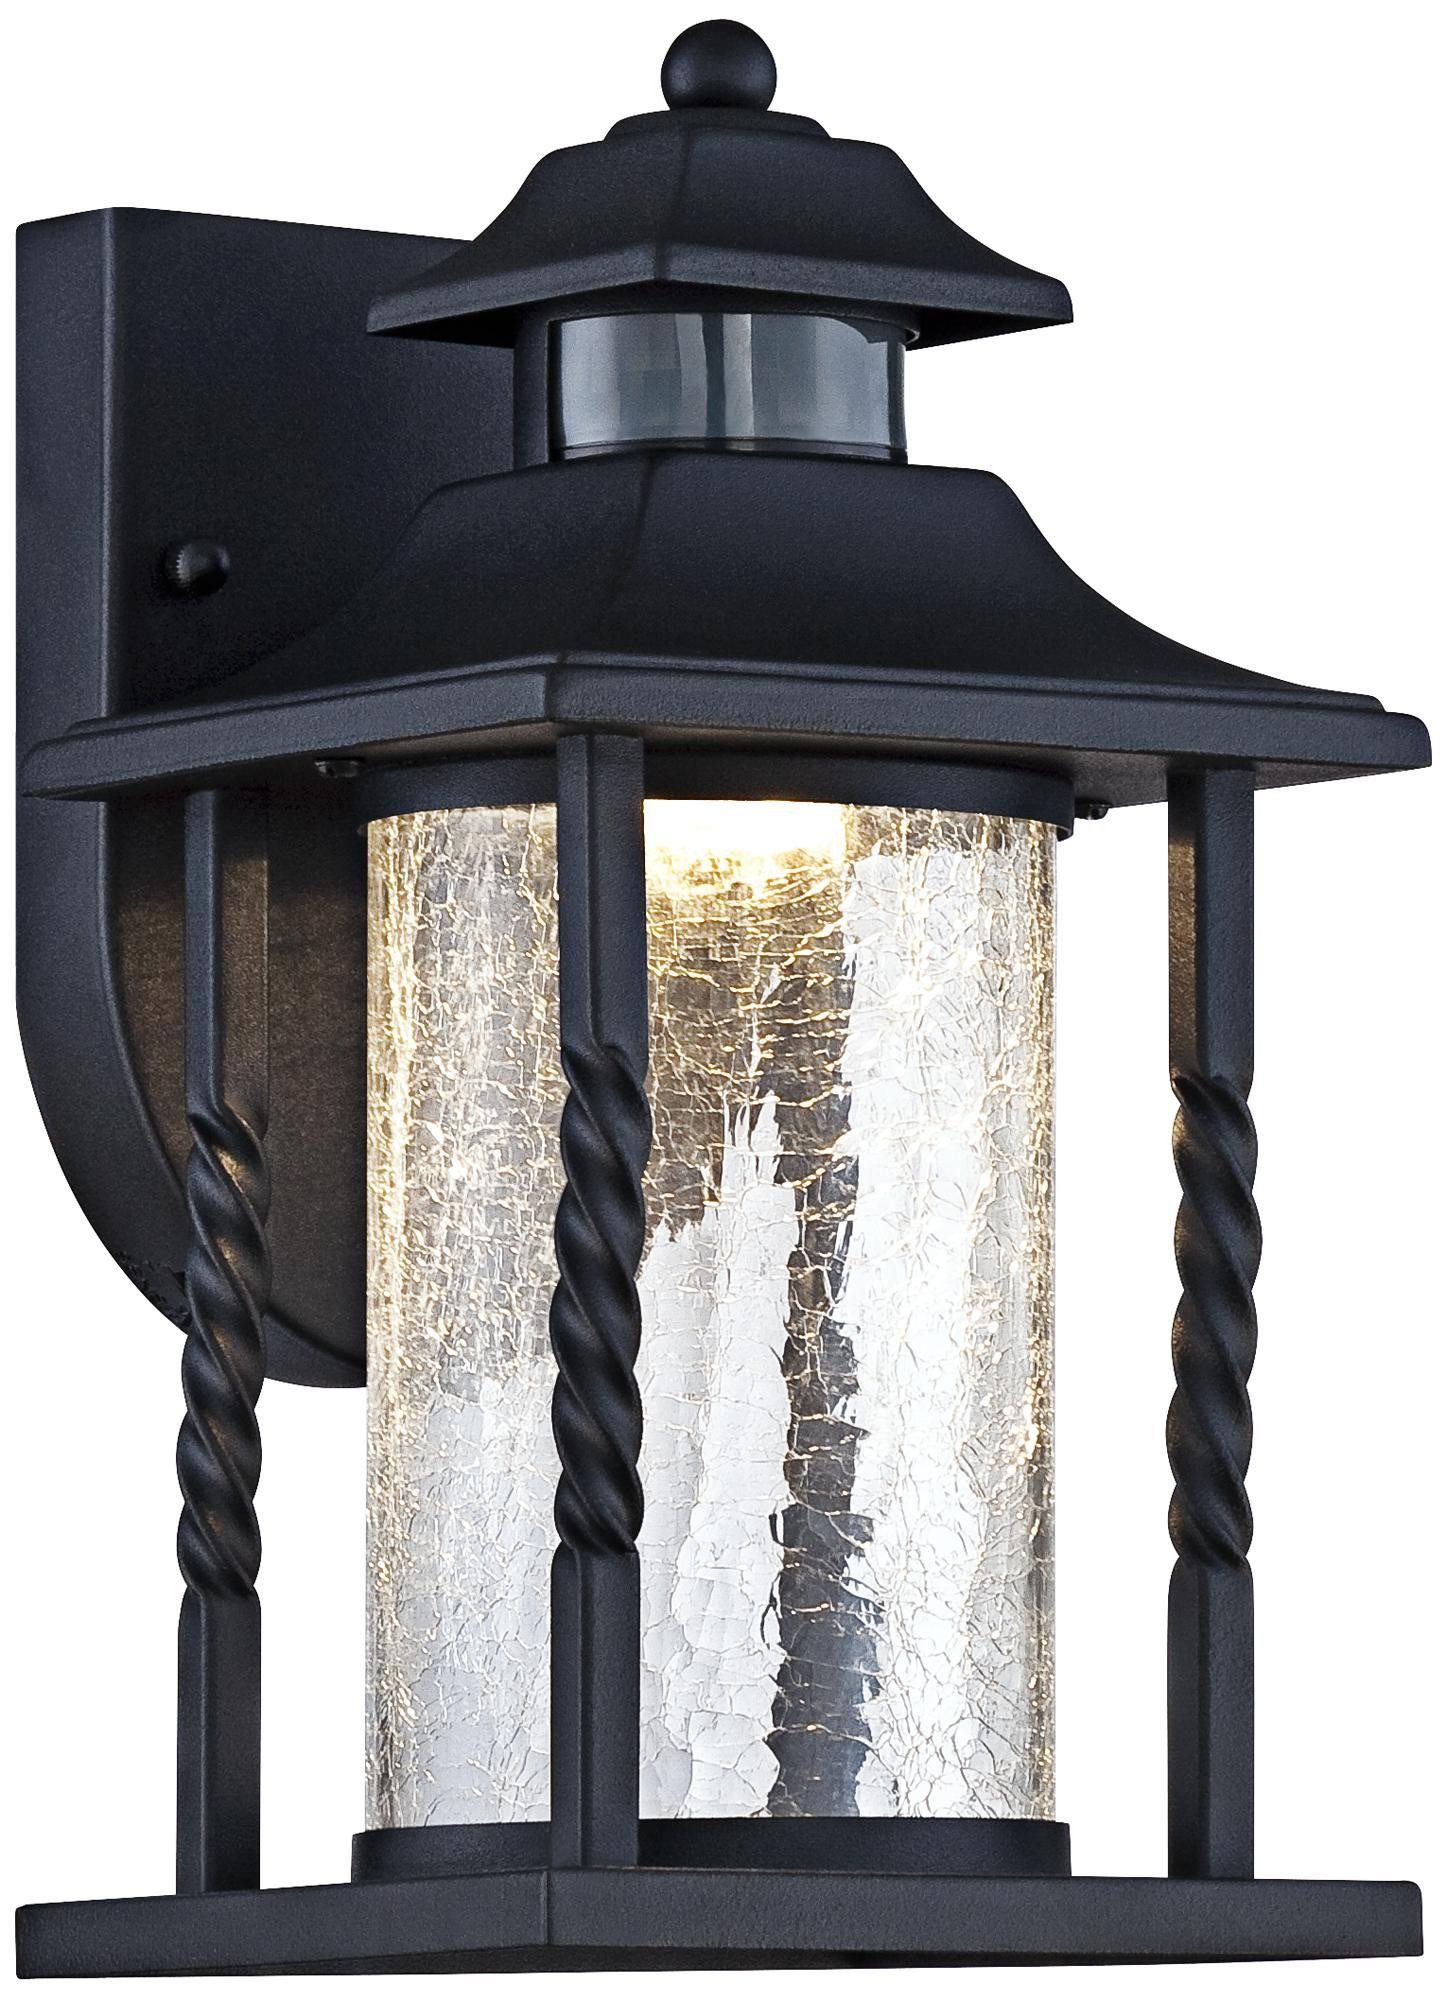 Westray 11 1 2 H Black Motion Sensor Led Outdoor Wall Light 7k617 Lampsplus Com Led Outdoor Wall Lights Outdoor Wall Lighting Outdoor Wall Light Fixtures